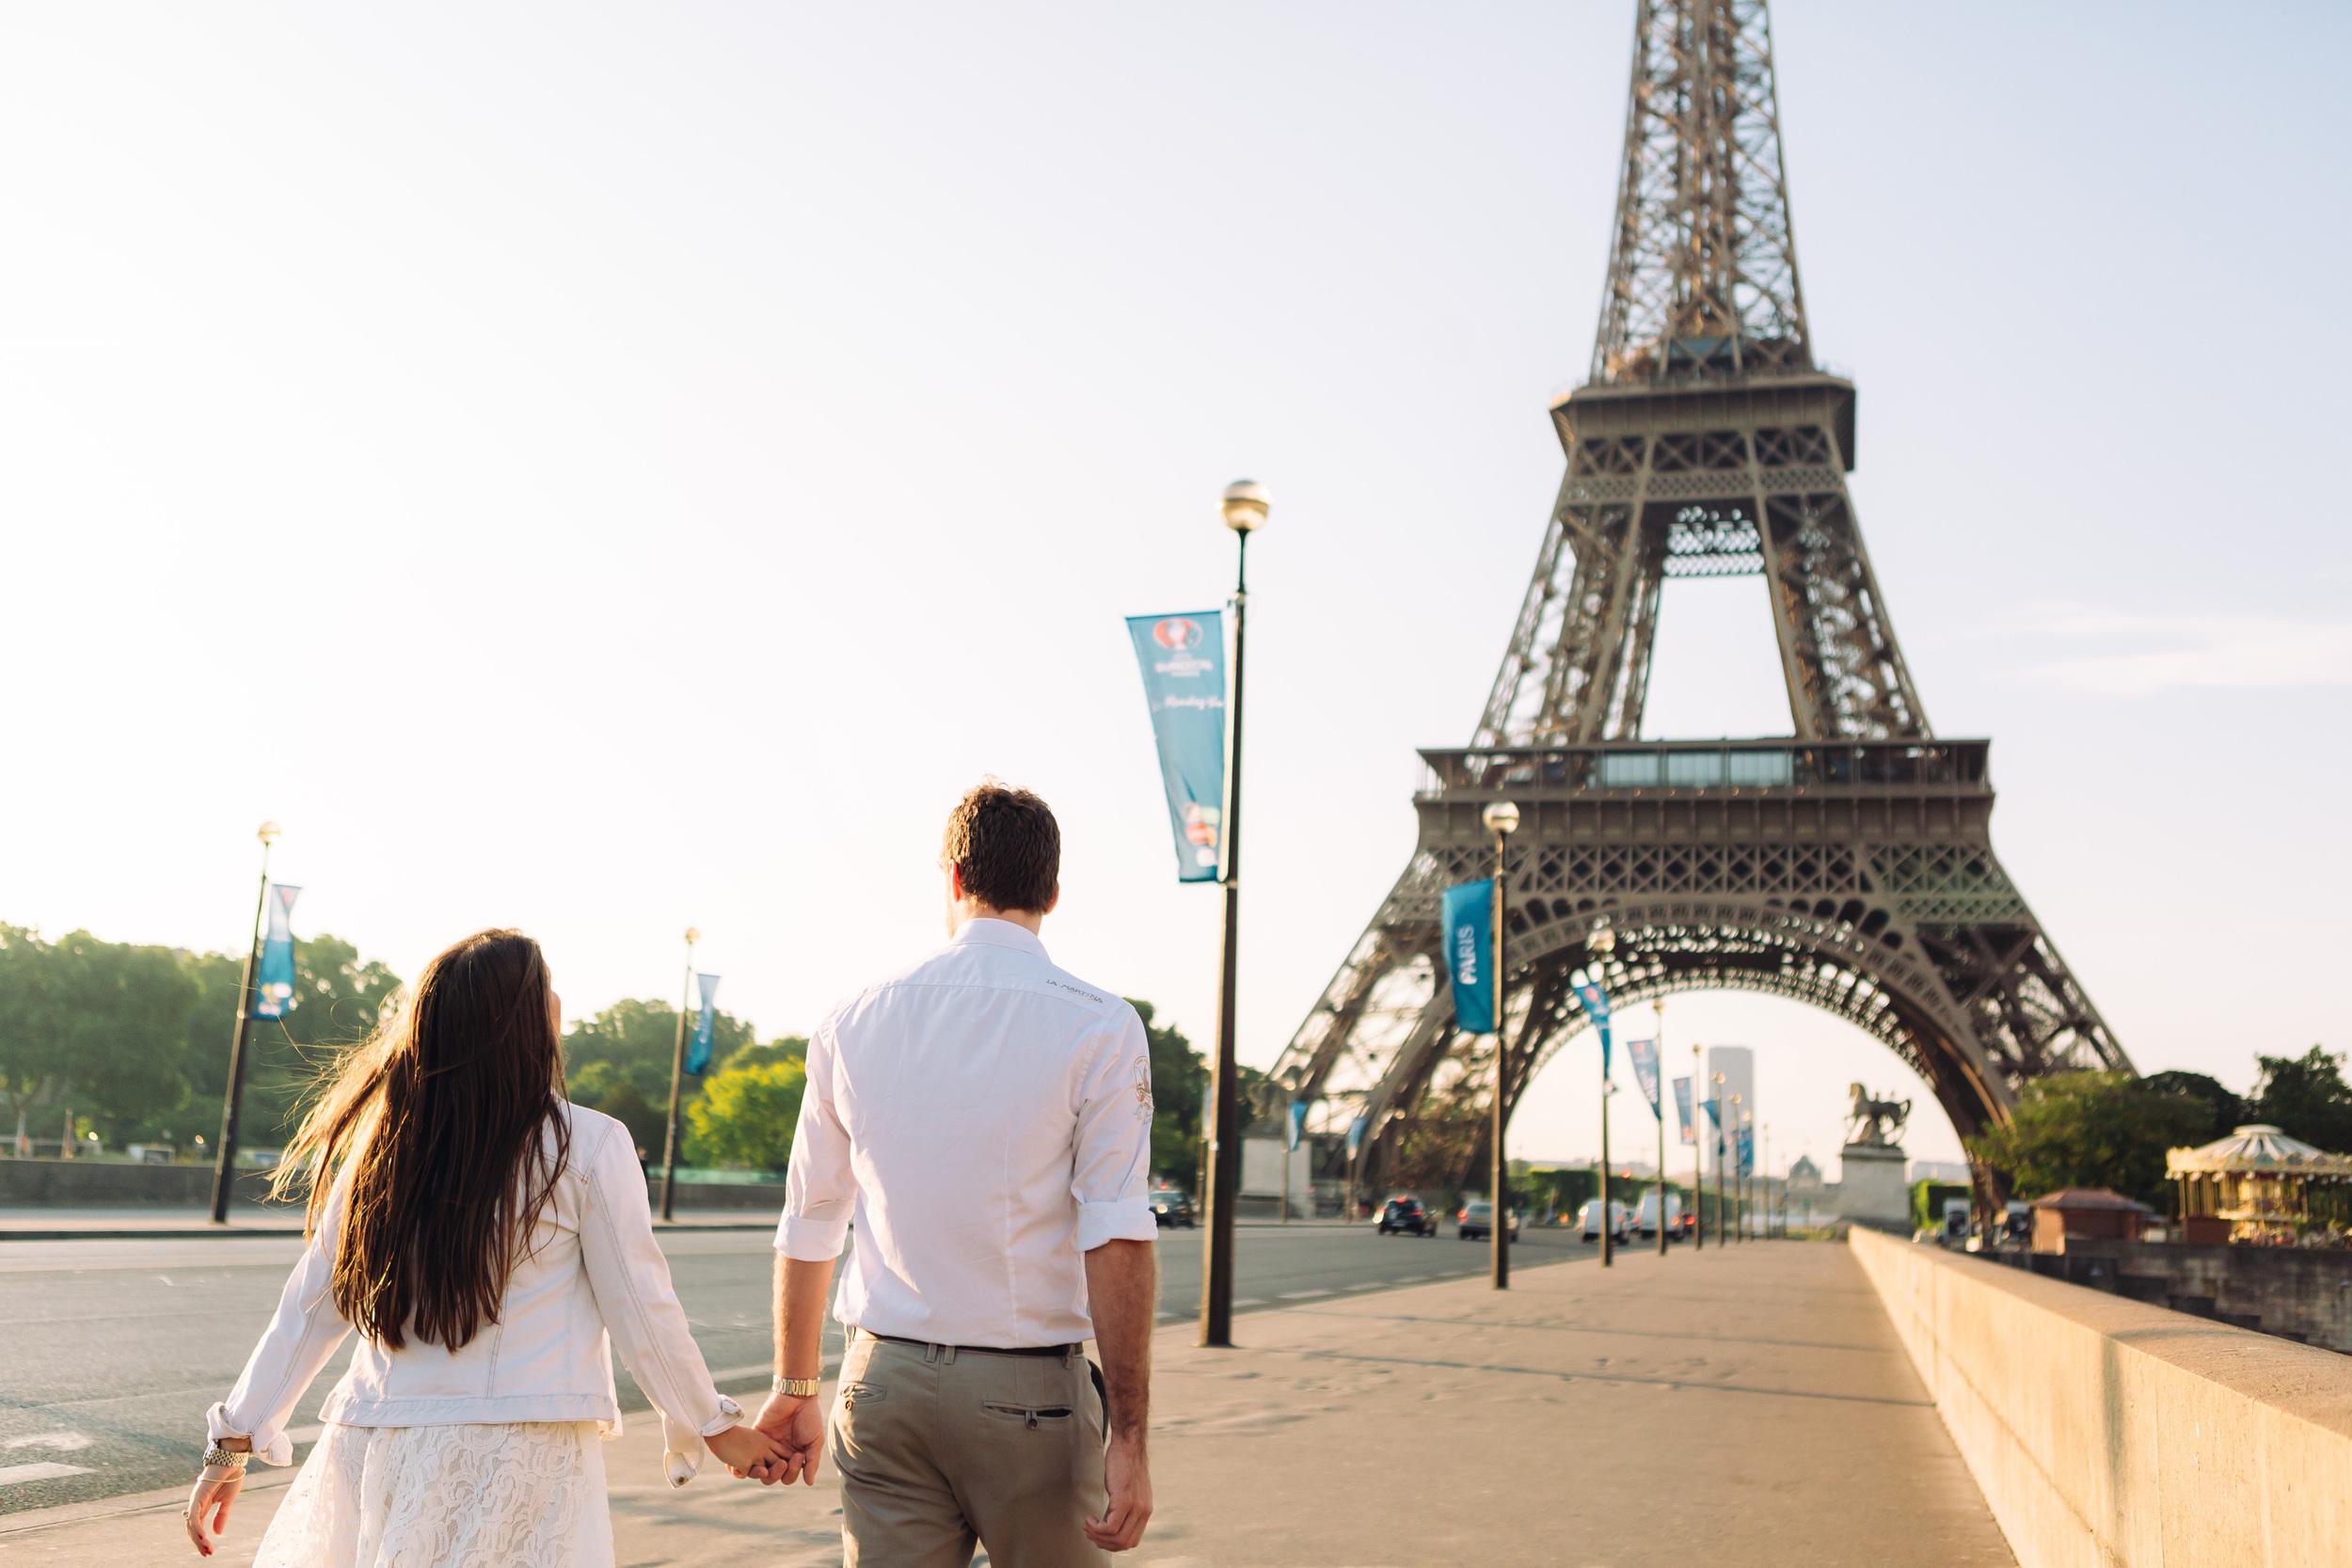 Photographer in Paris, Eiffel Tower, Lovestory, Trocadero, Iheartparisfr